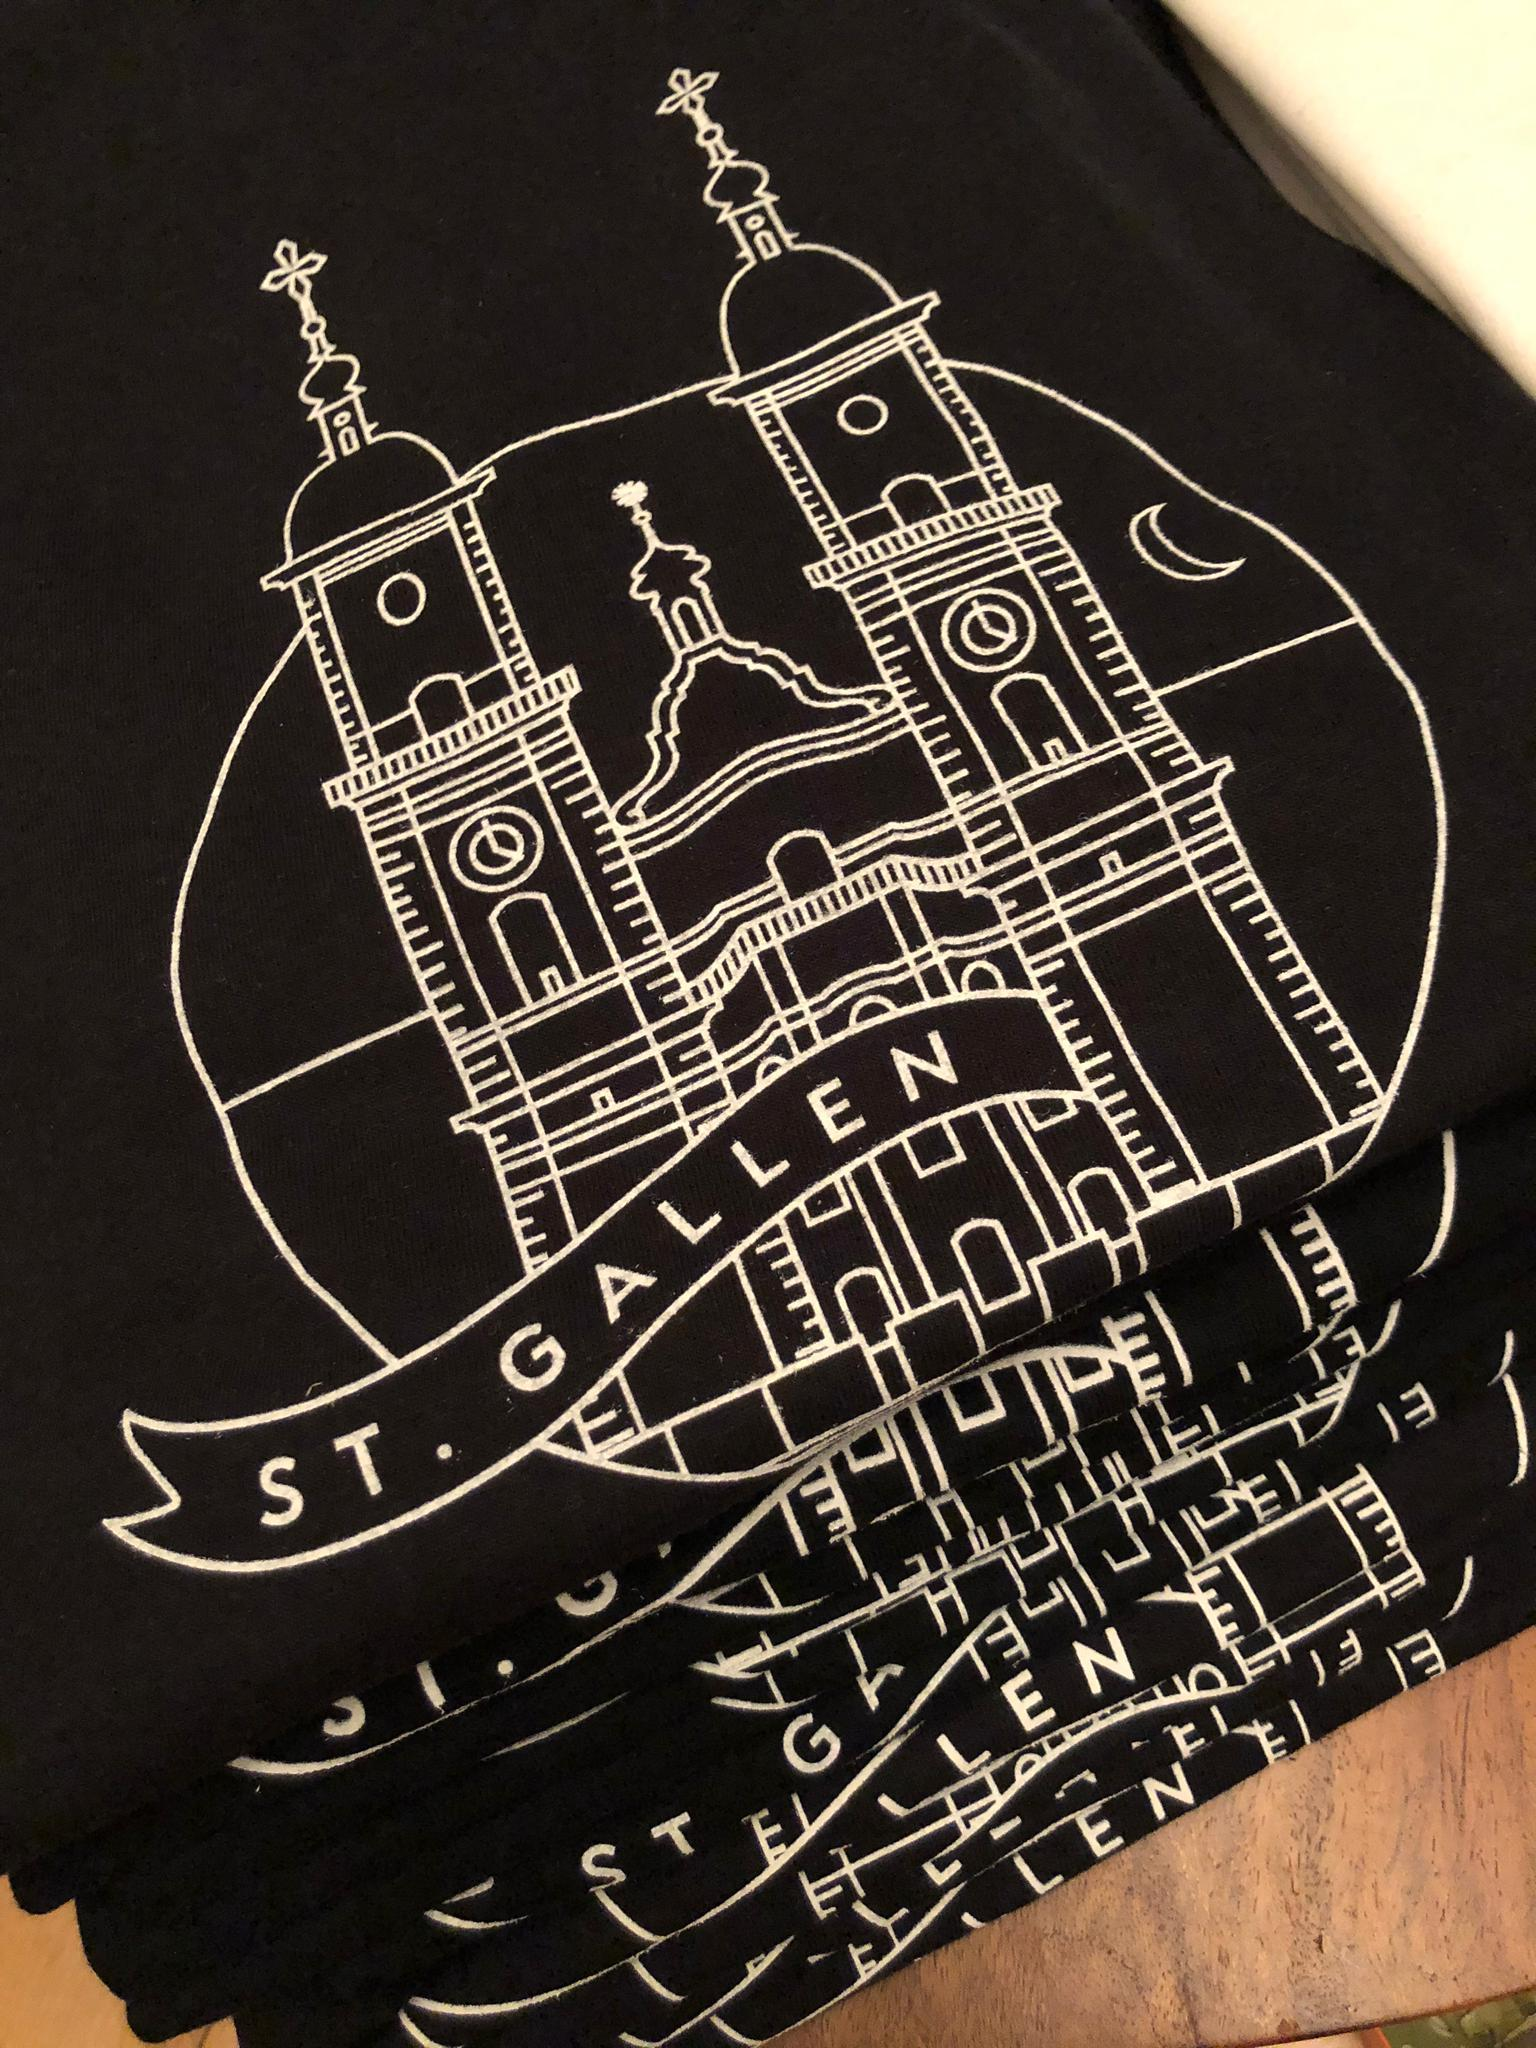 shirt_stgallen-1_1024x1024@2x